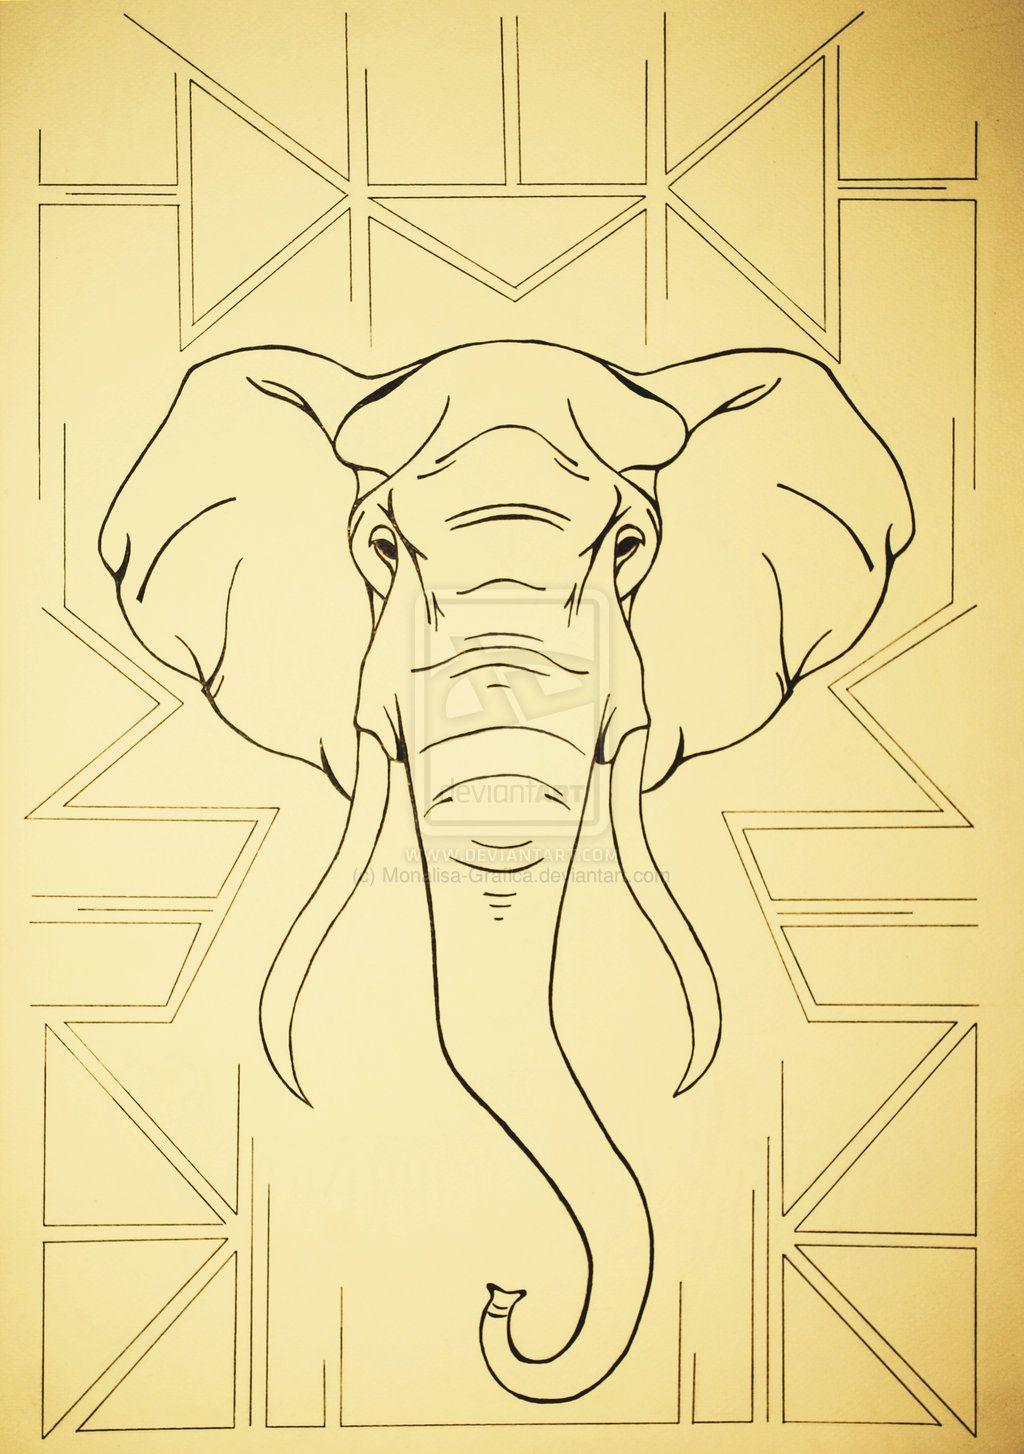 geometric_elephant__outline | Tattoos | Pinterest ... - photo#34